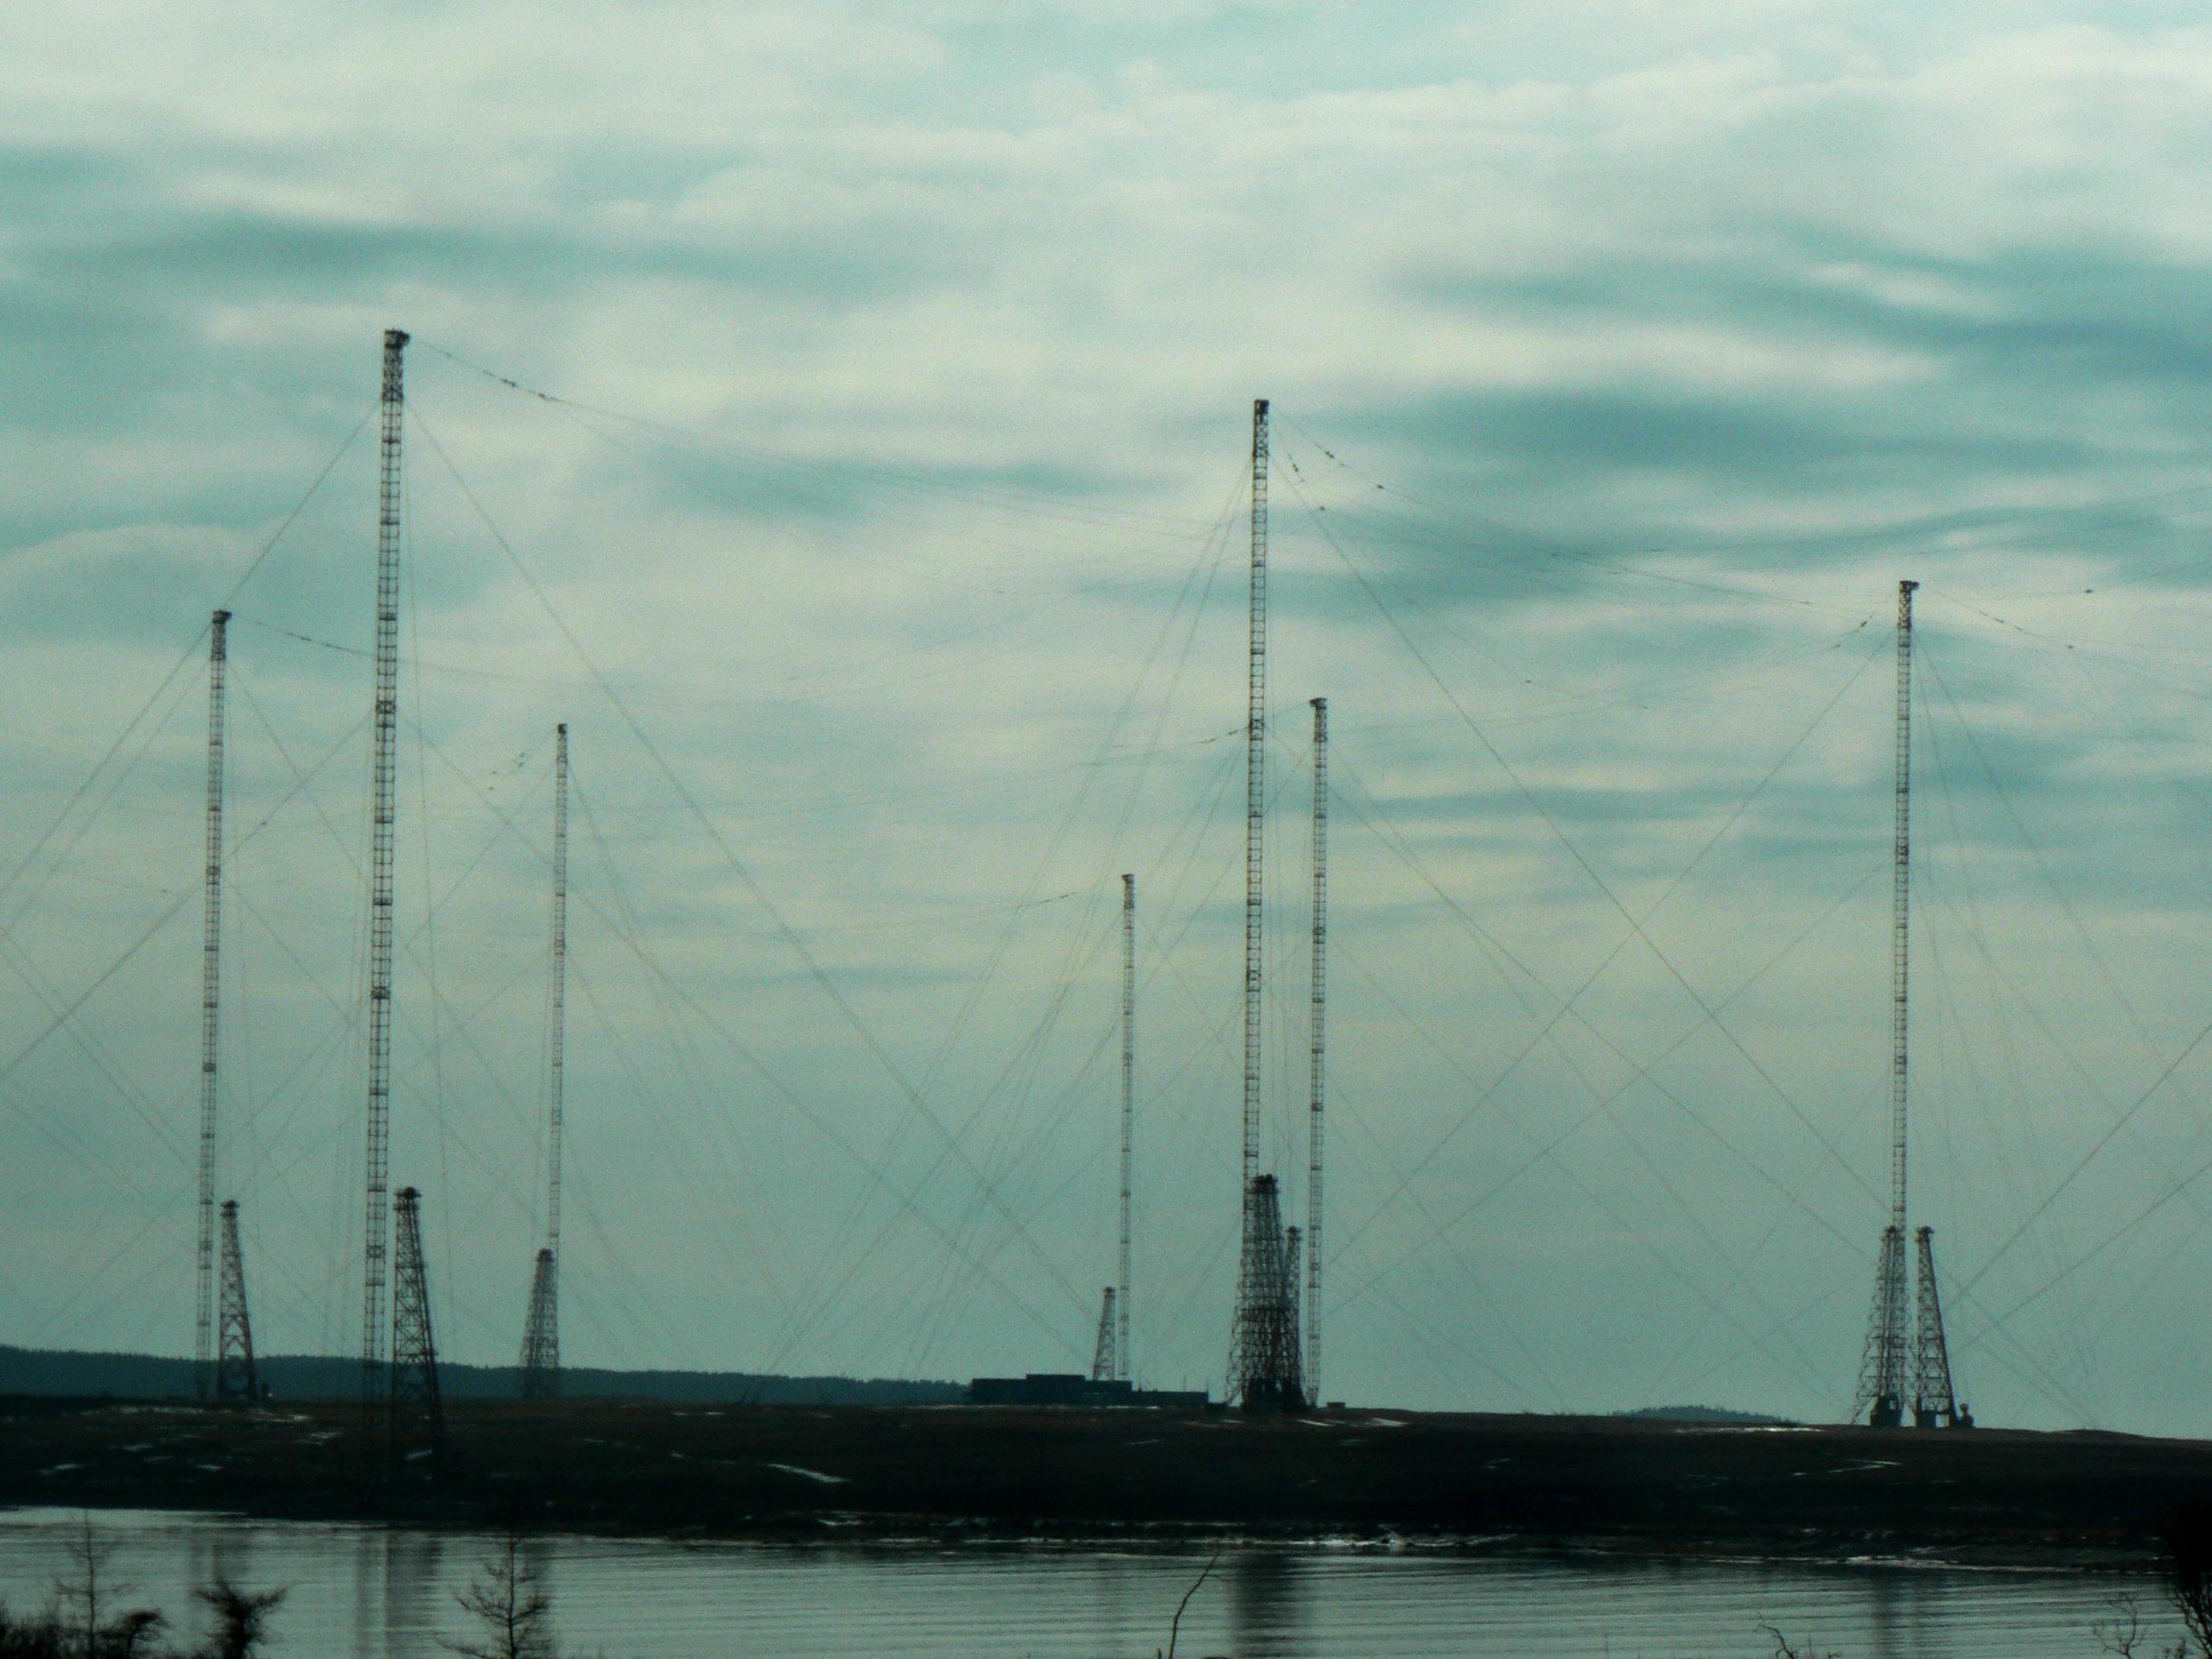 VLF Transmitter Cutler - Wikipedia